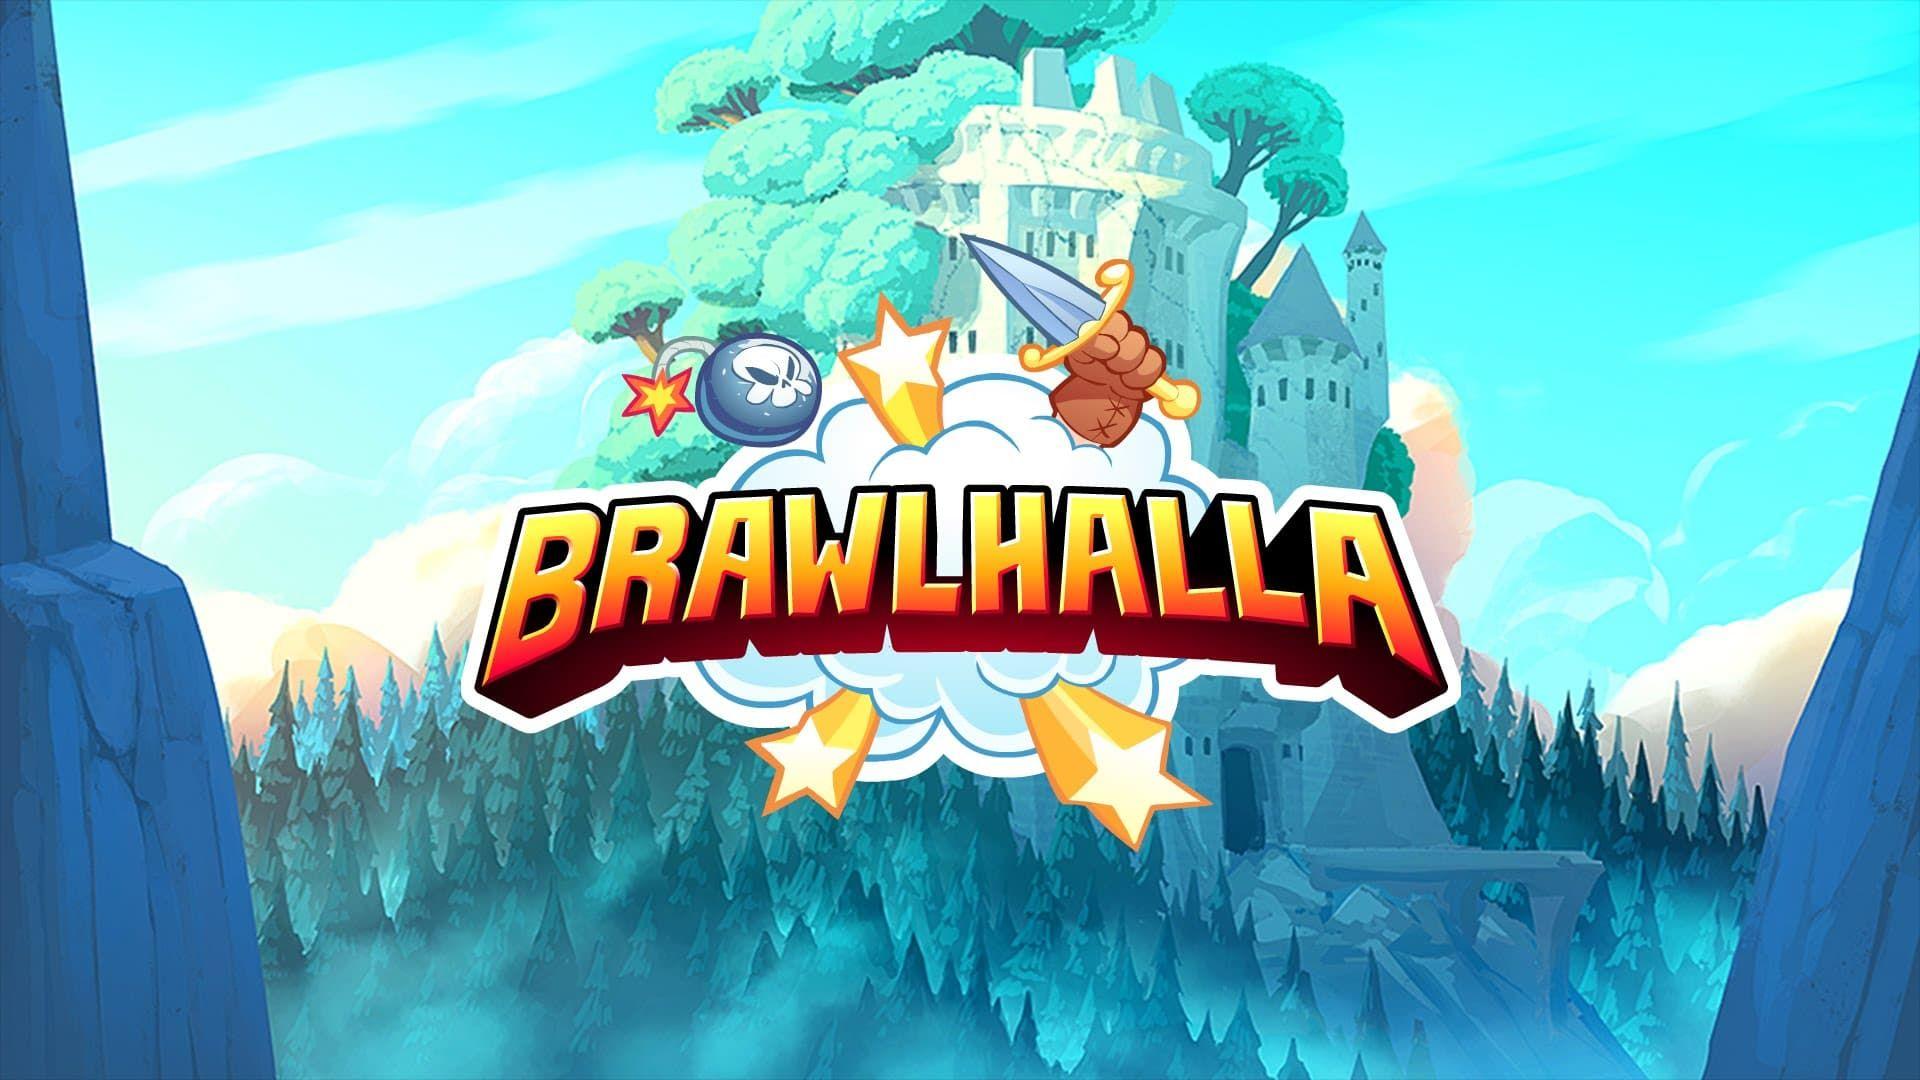 Brawlhalla Version 3 33 is available | NintendoReportersEN